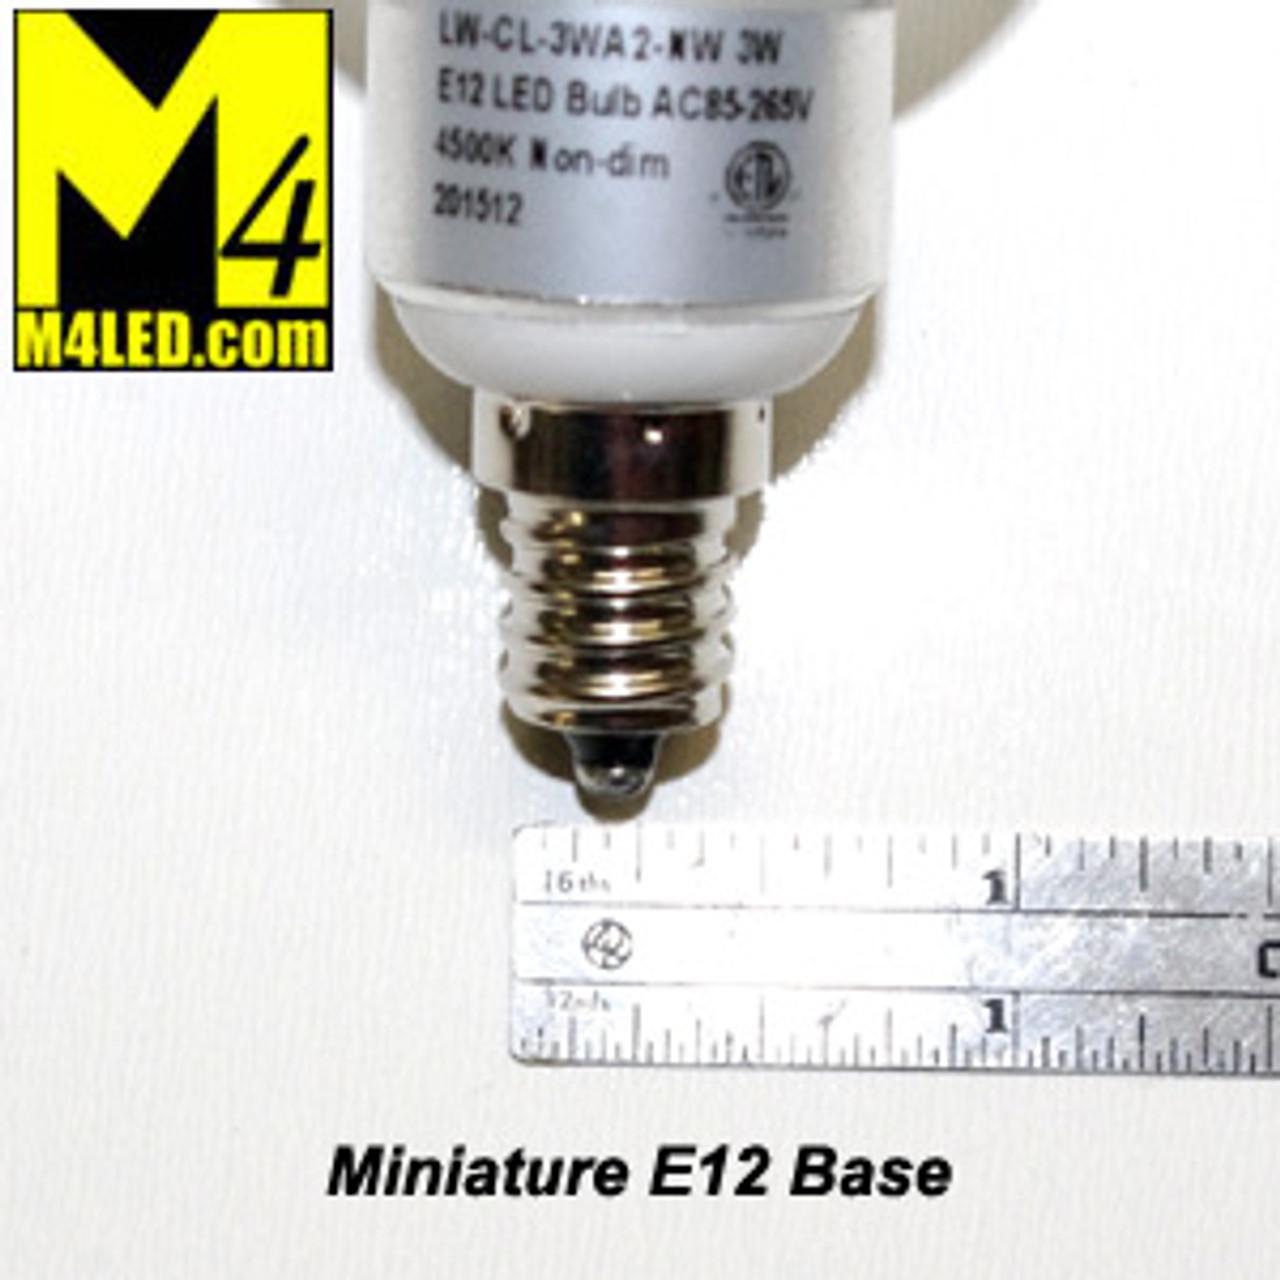 Home or RV LV-CL-3WA2-WW 120v Warm White Screw in Vanity Globe with Mini E12 Base